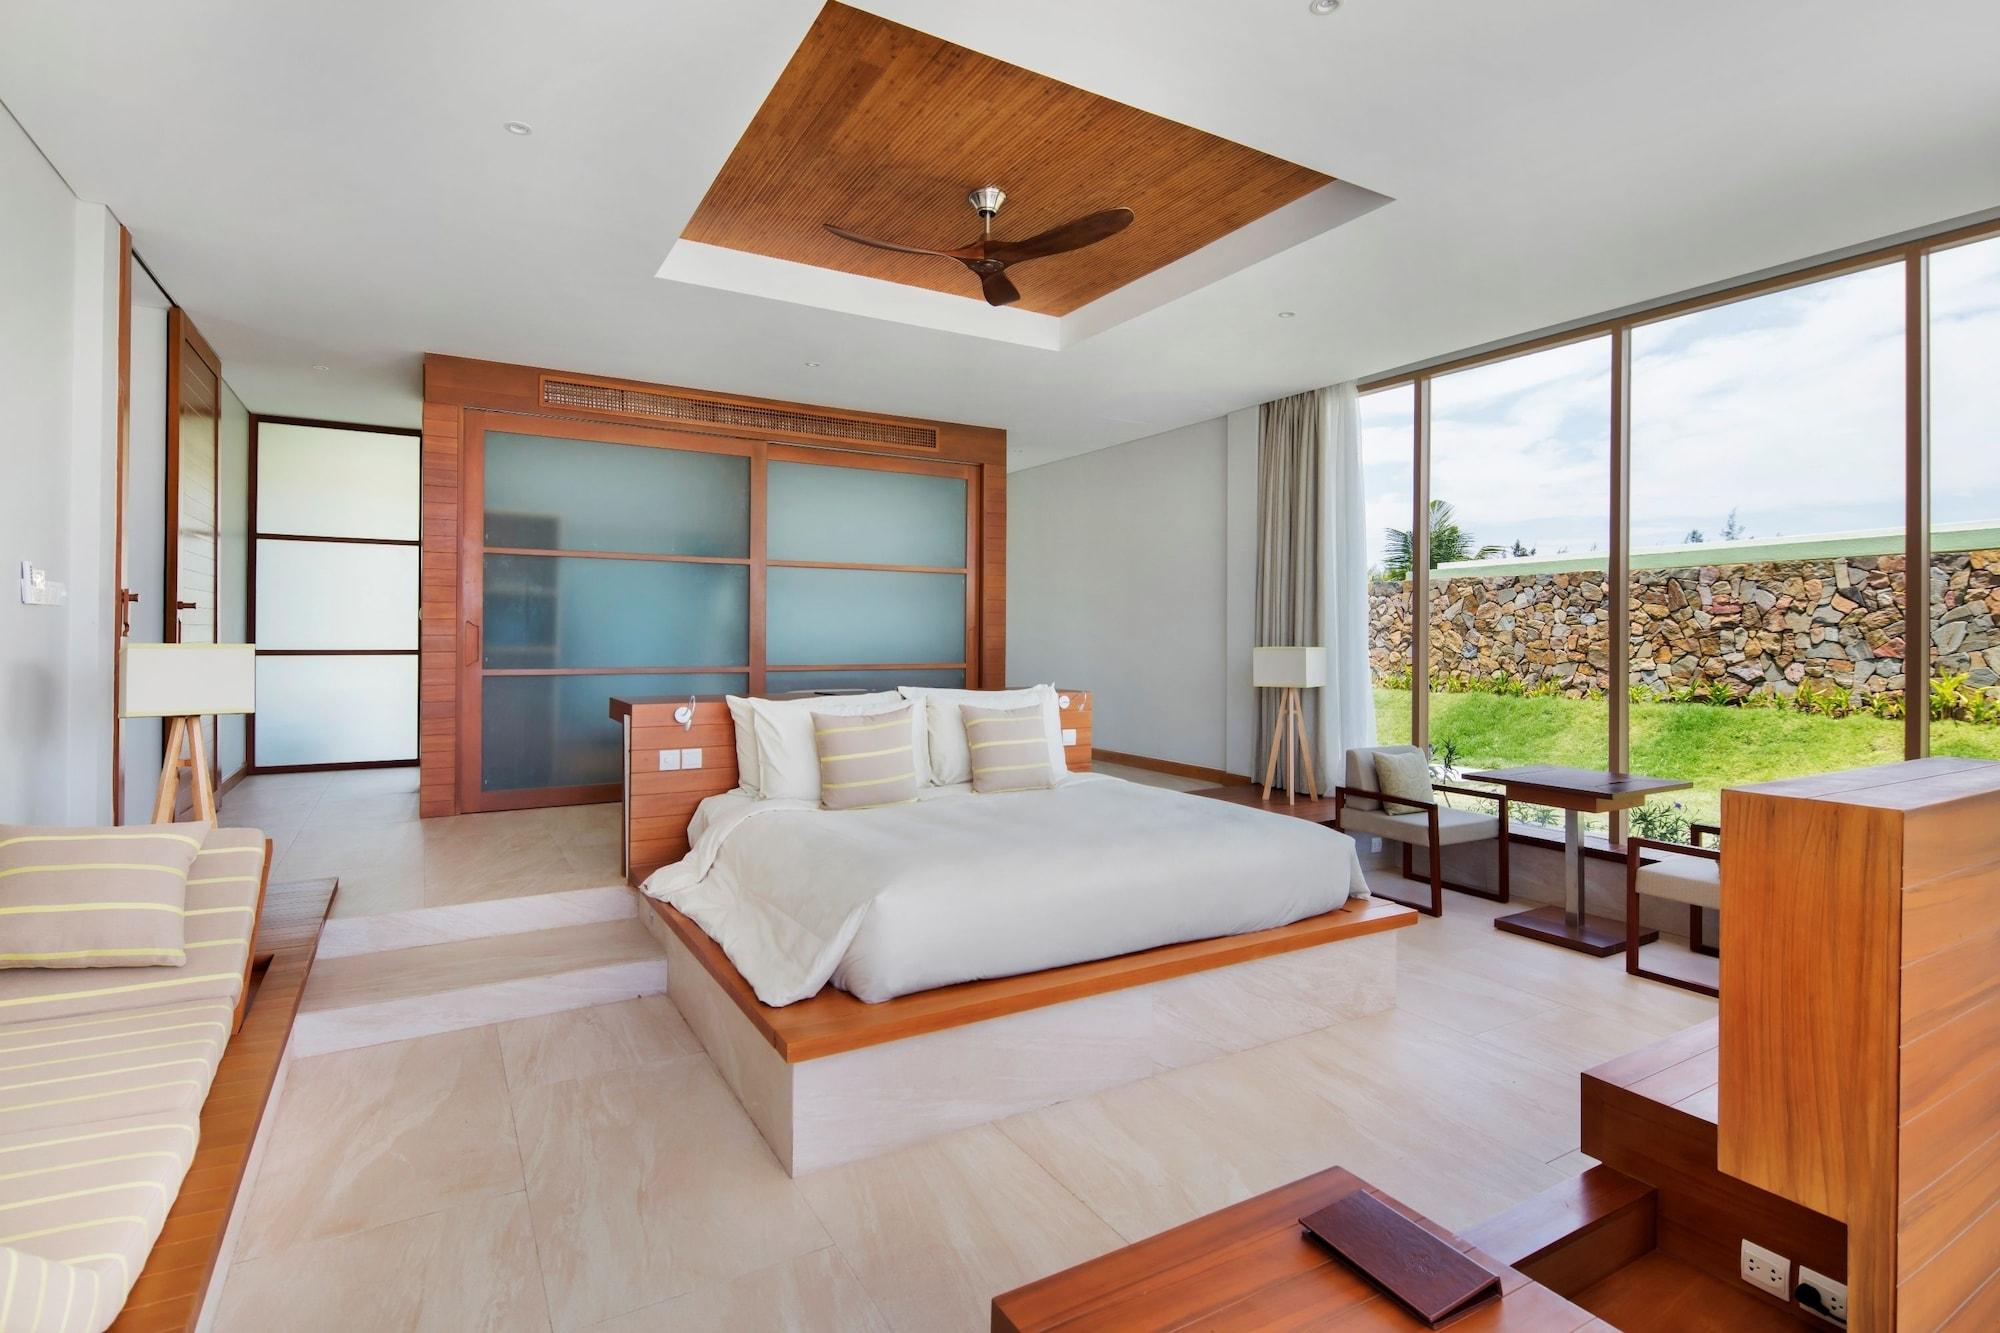 FLC Luxury Resort Quy Nhon, Qui Nhơn